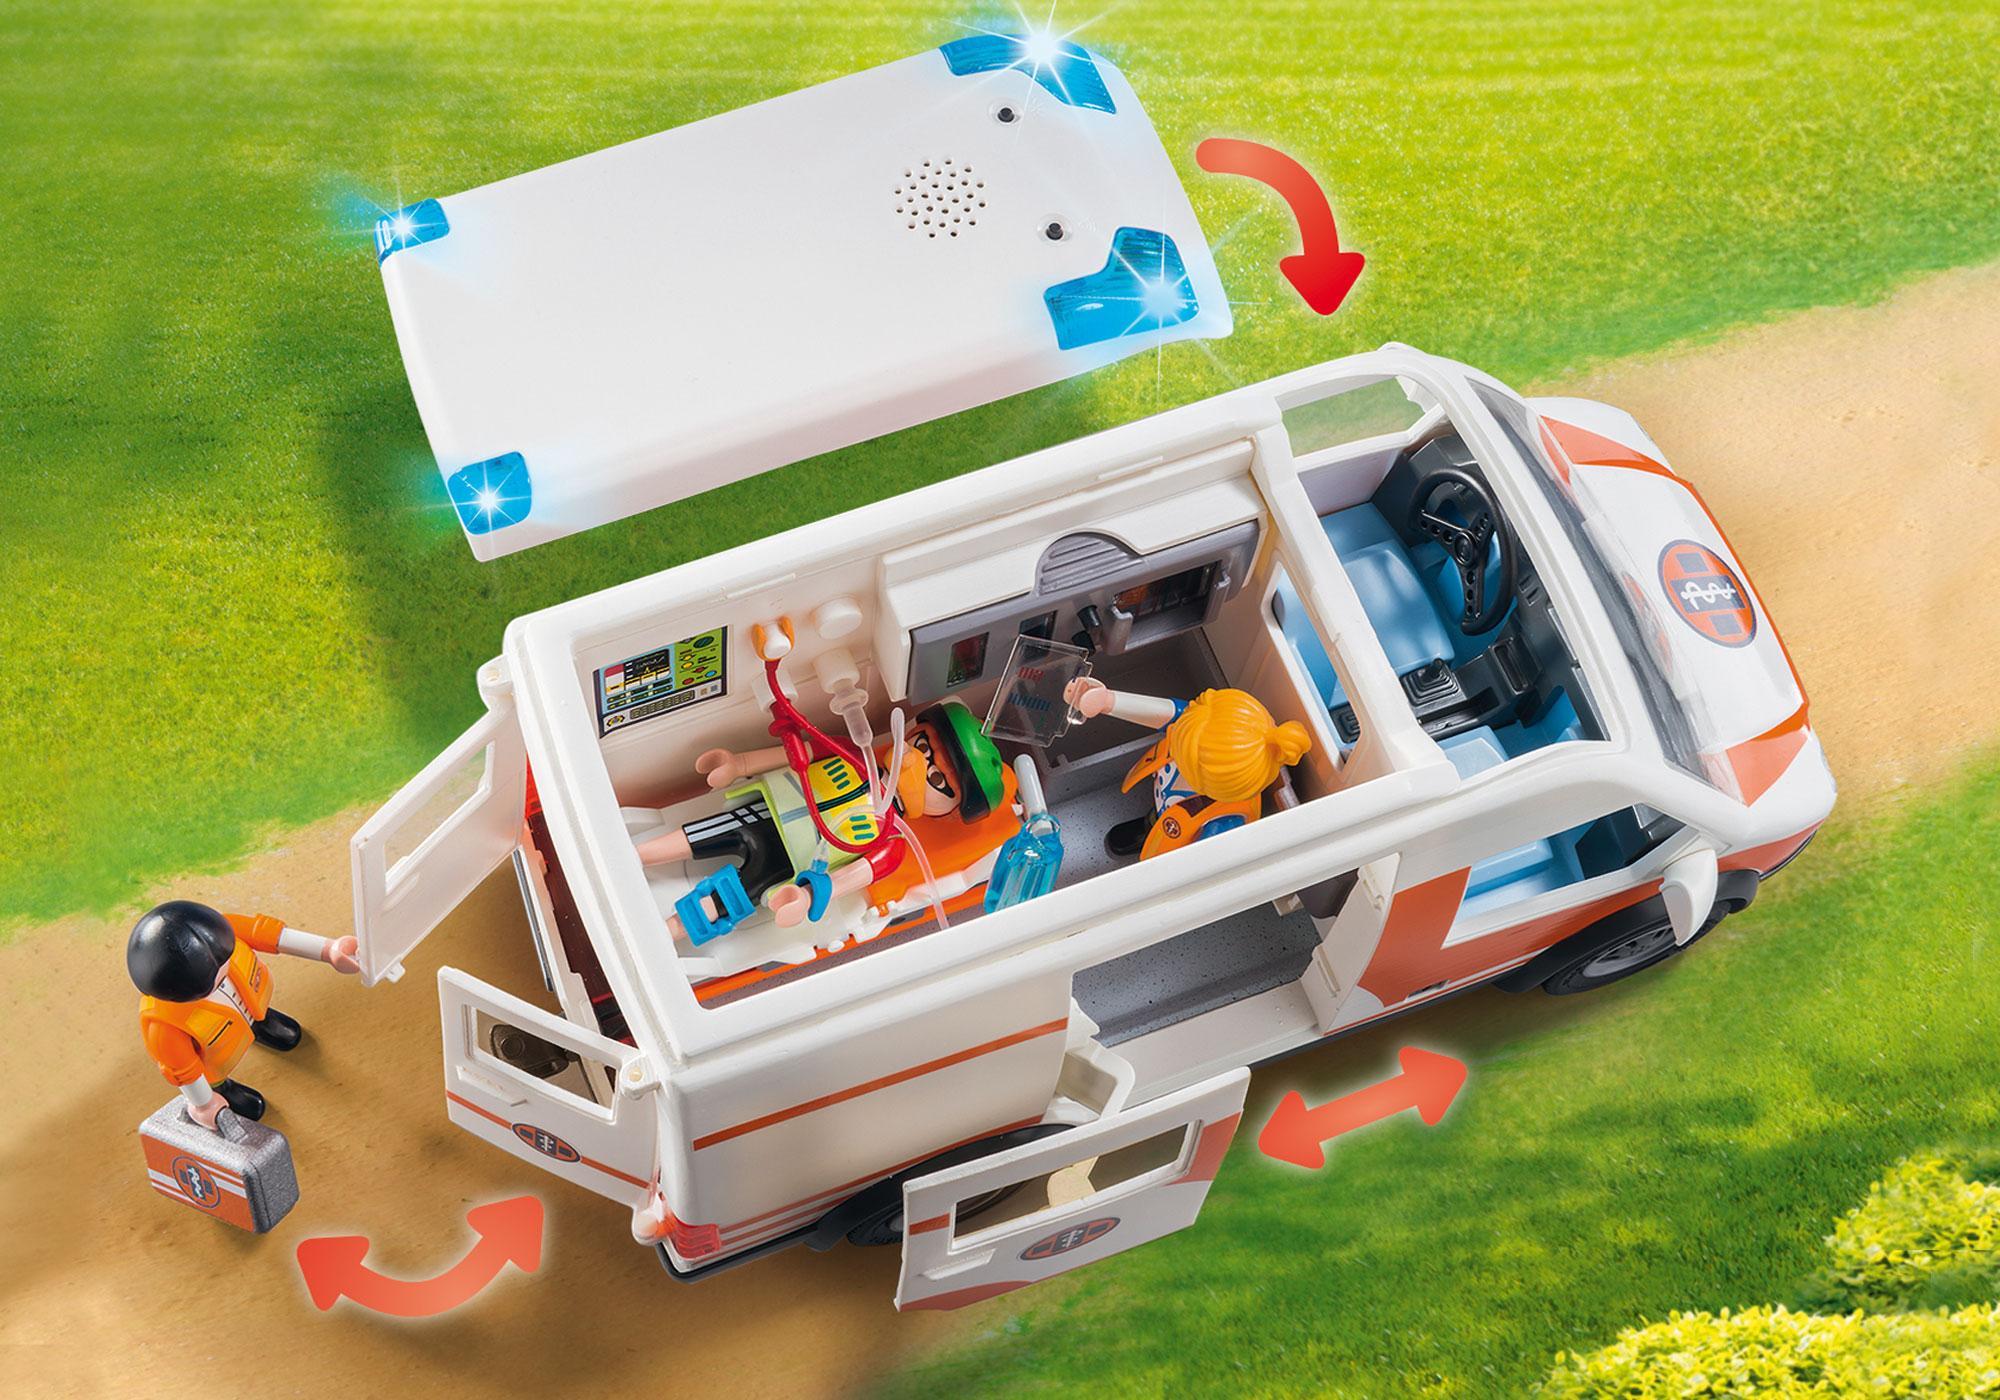 http://media.playmobil.com/i/playmobil/70049_product_extra3/Ambulance med blinklys